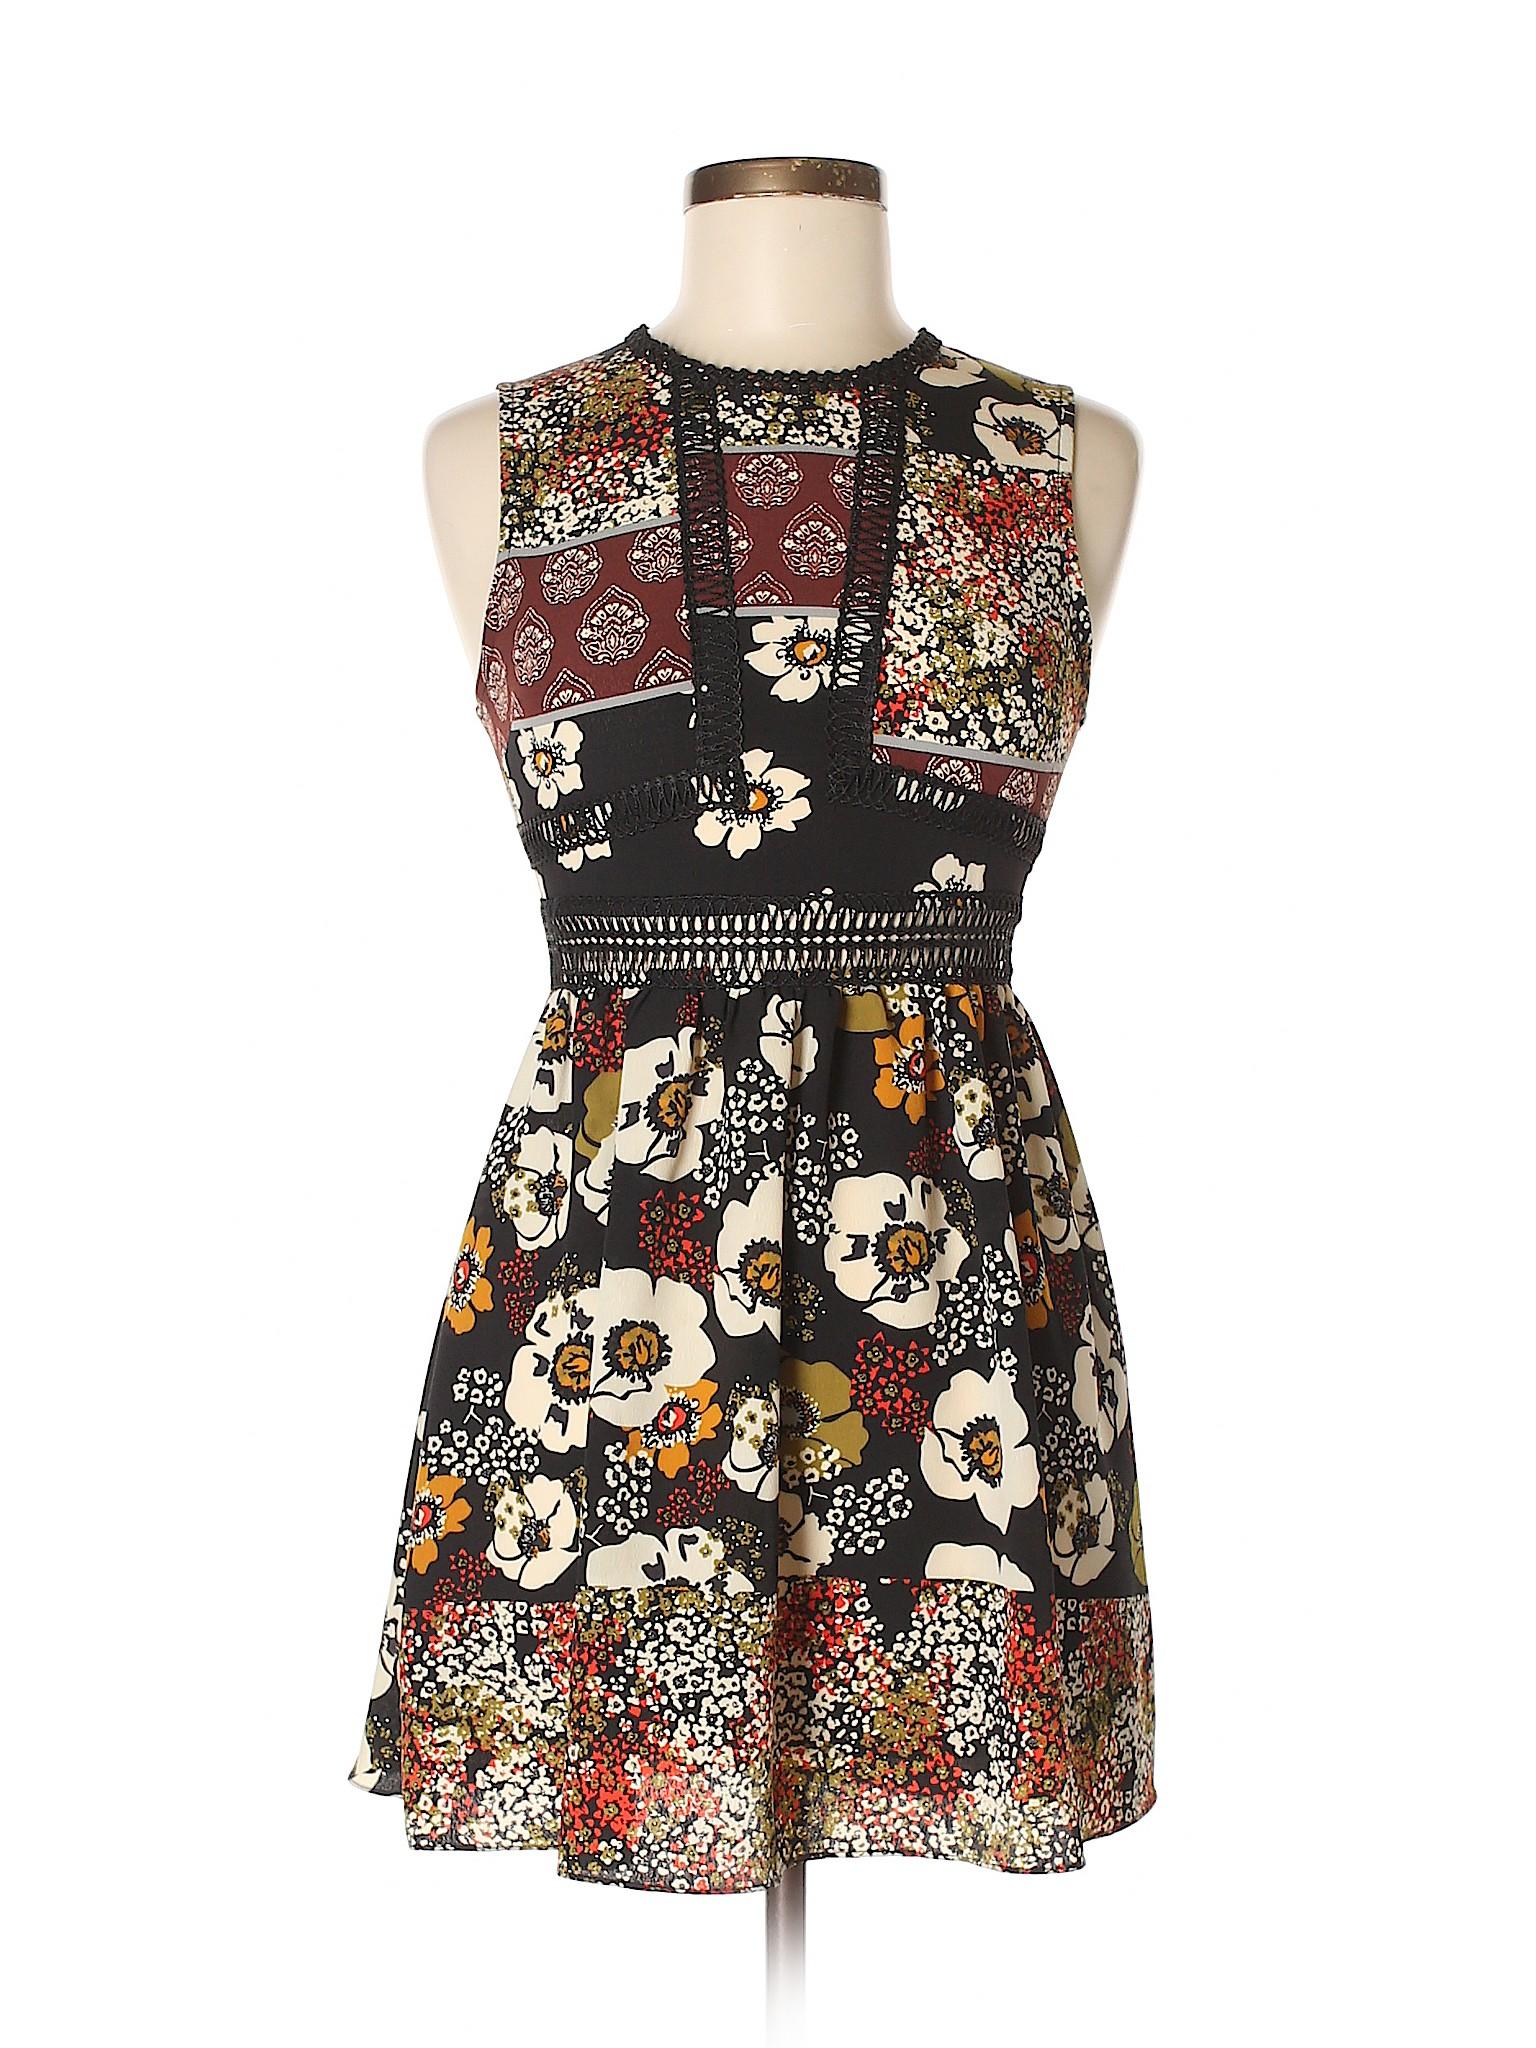 Topshop Boutique winter Casual Dress winter Boutique Topshop winter Casual Dress Boutique Topshop E8Erqwd